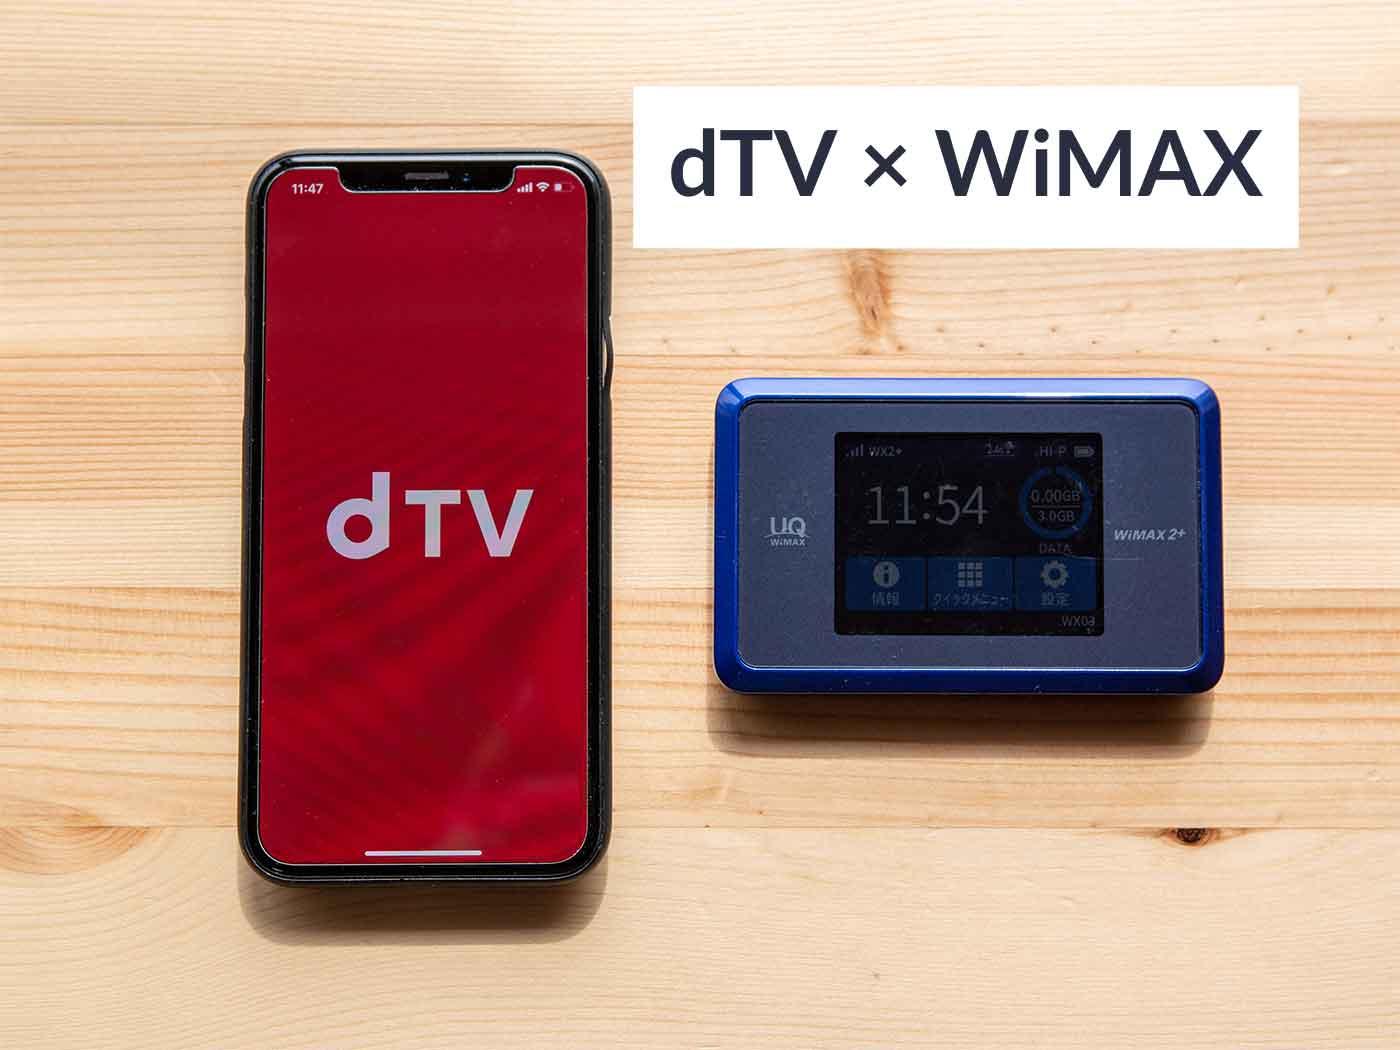 dTVとWiMAXのレビュー記事